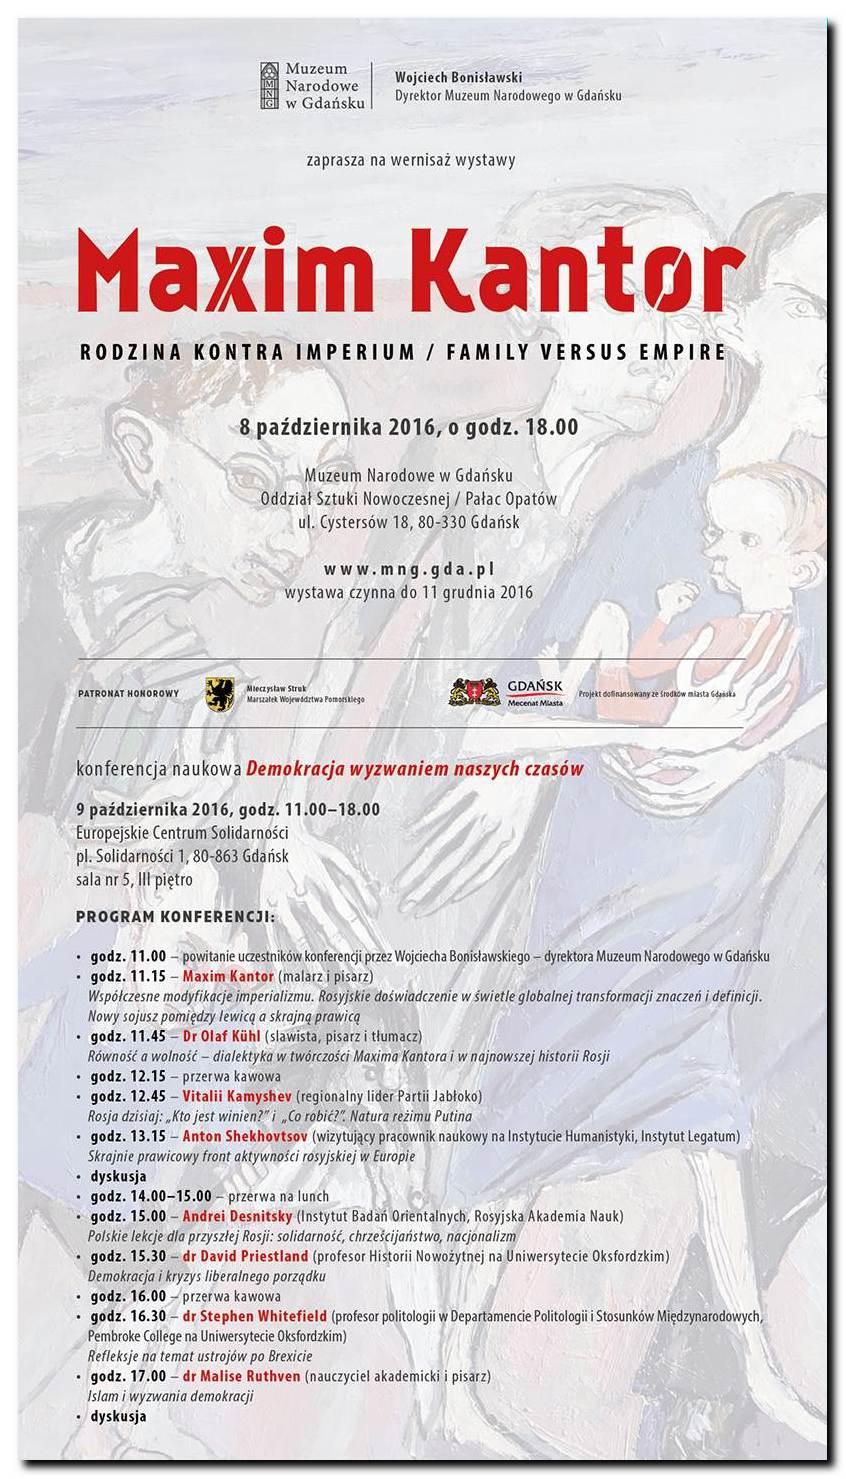 maxim-kantor-zaproszenie-pl-kopia